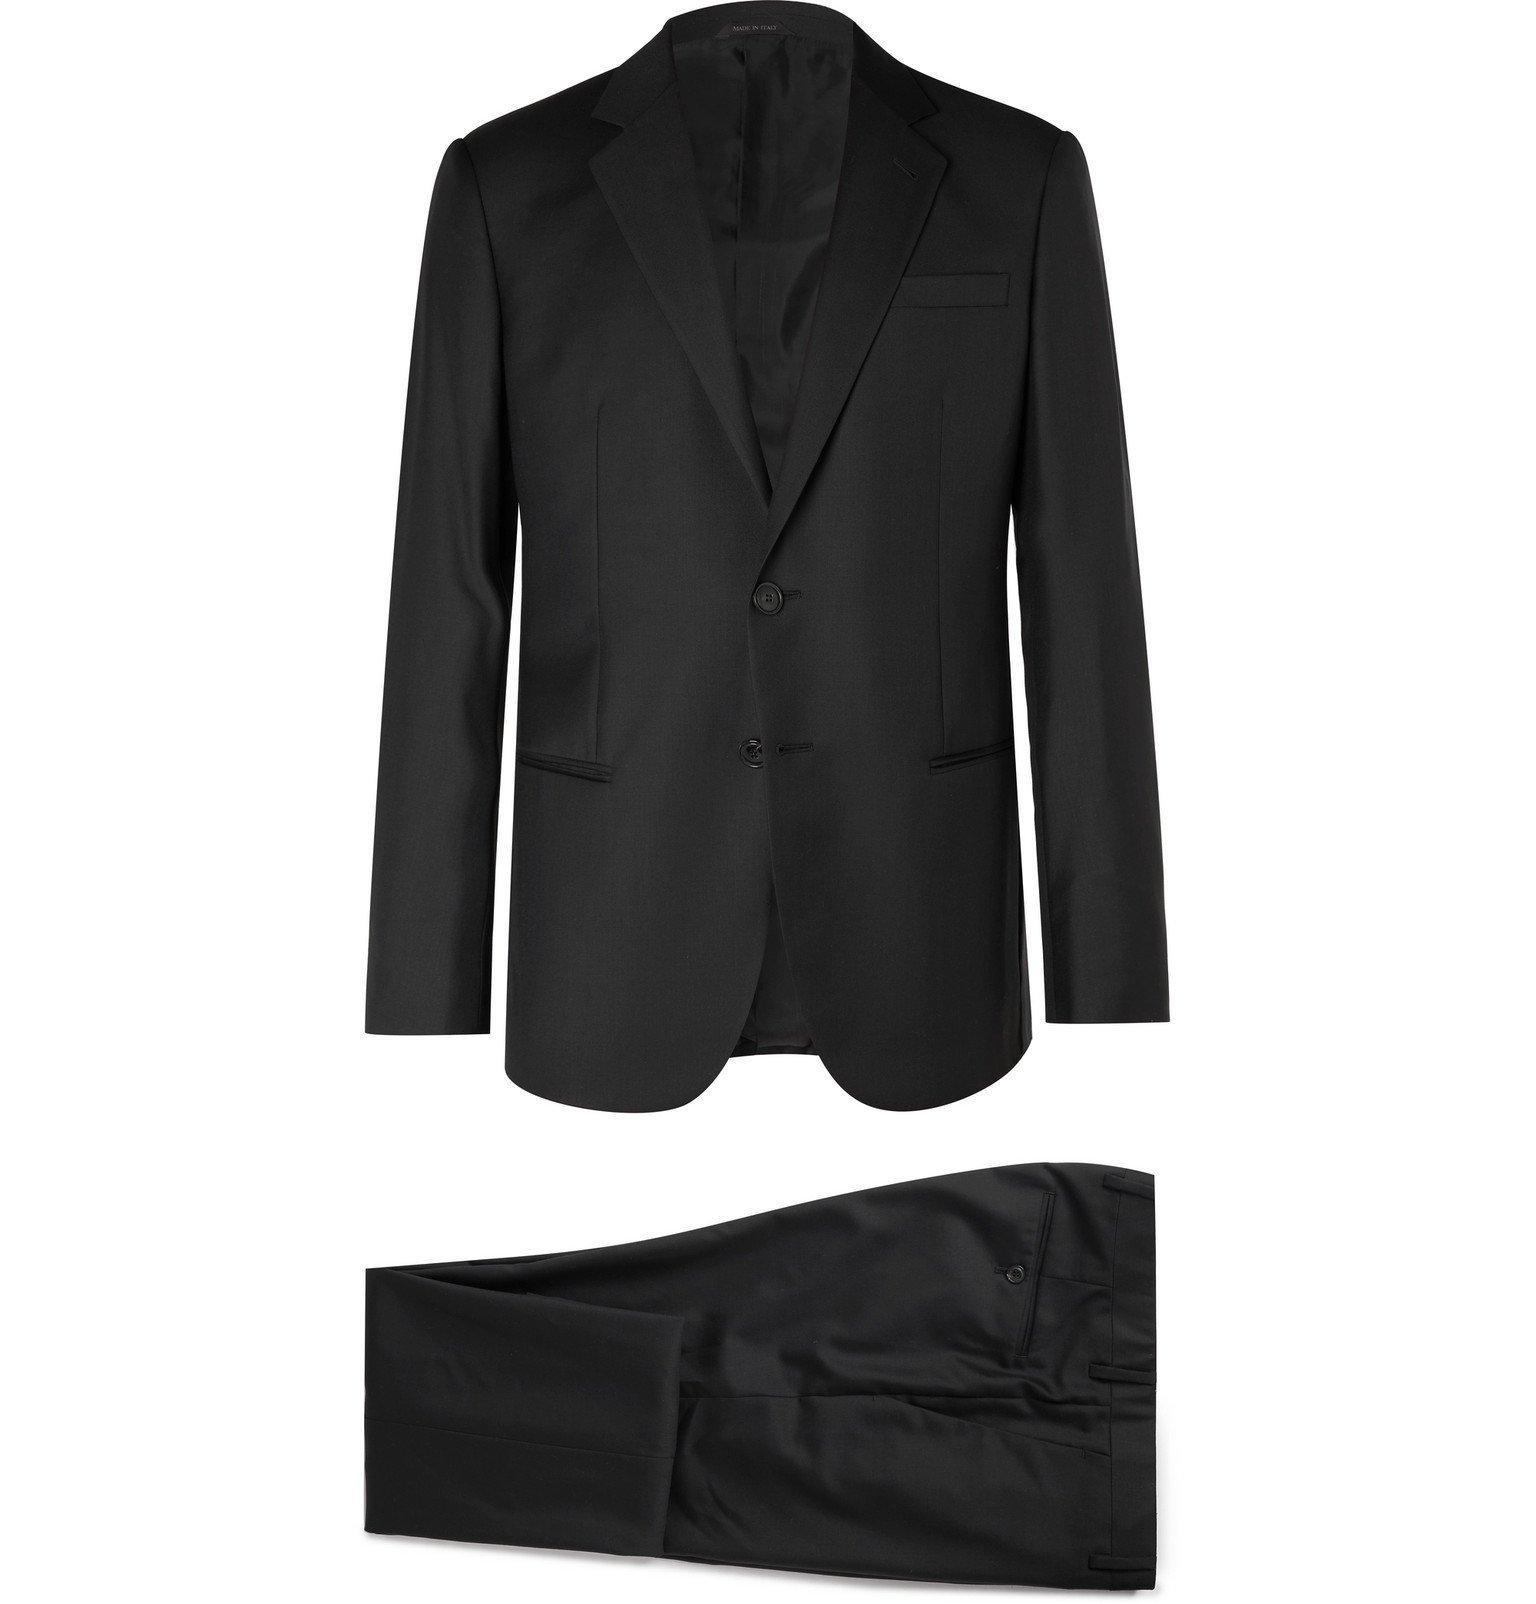 Giorgio Armani - Black Slim-Fit Virgin Wool and Cashmere-Blend Suit - Black